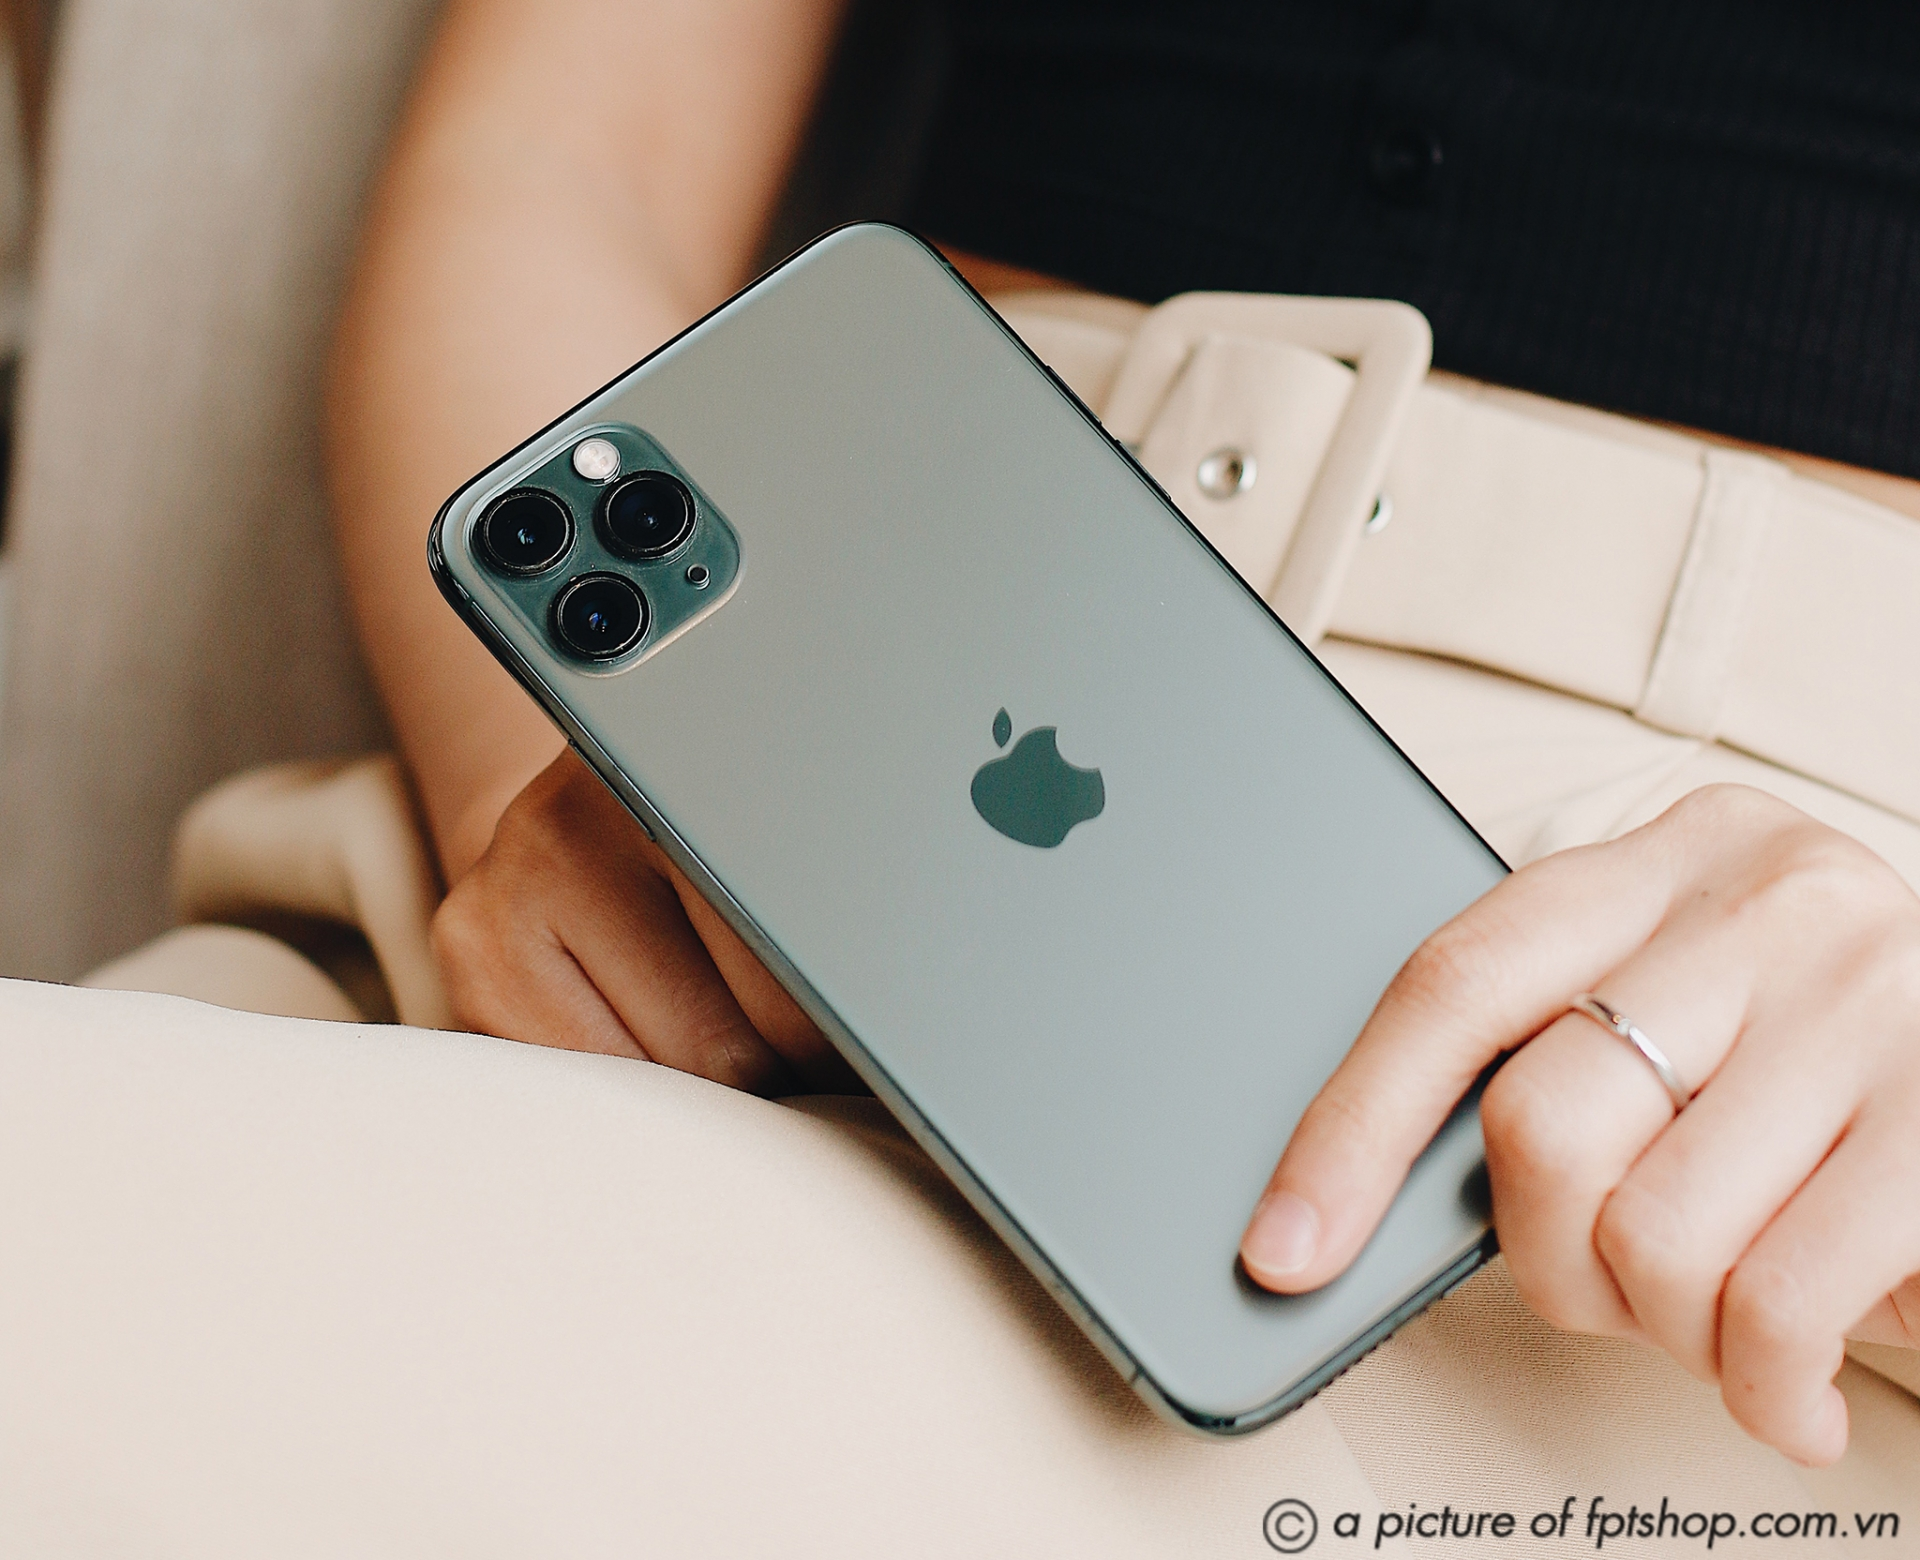 fpt shop chinh thuc phan phoi bo 3 iphone 11 chinh hang gia khoi diem tu 22 trieu dong